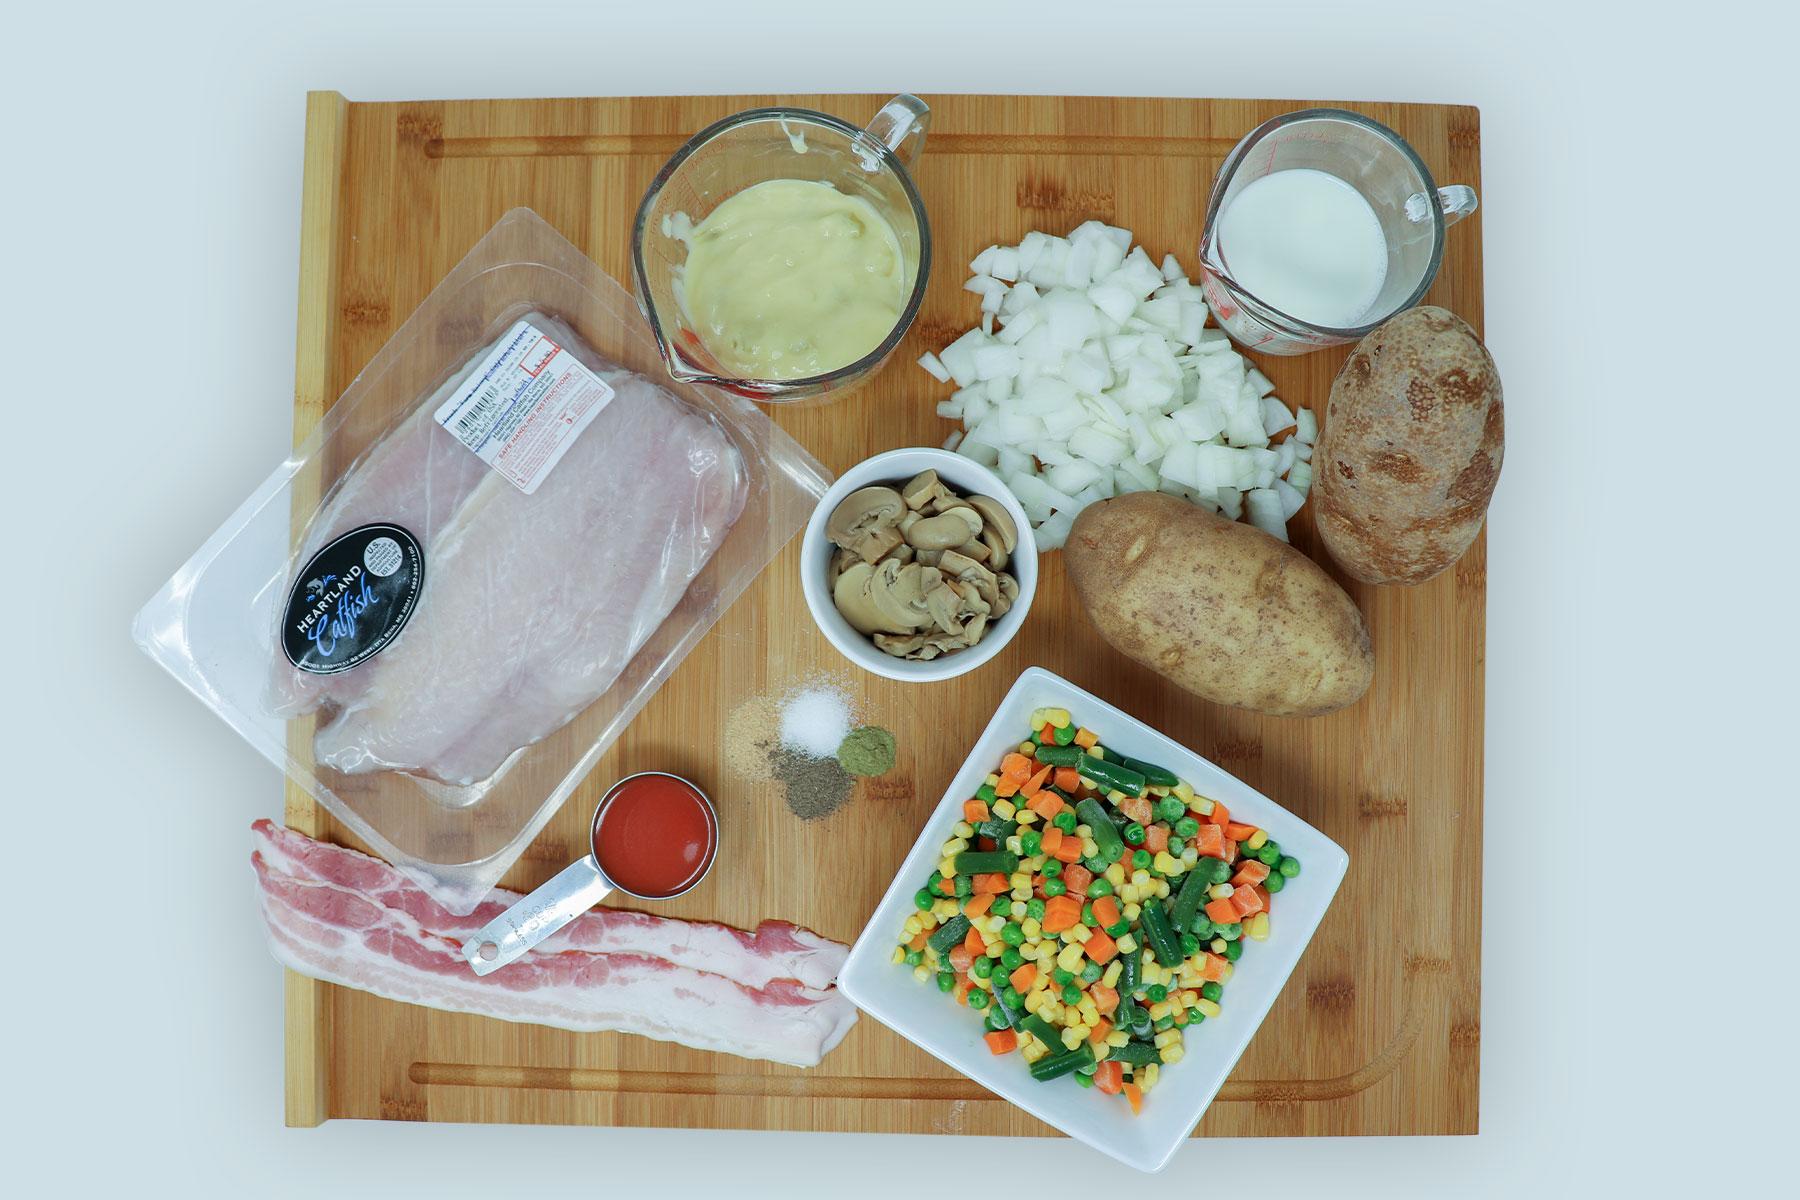 catfish stuffed baked potato ingredients